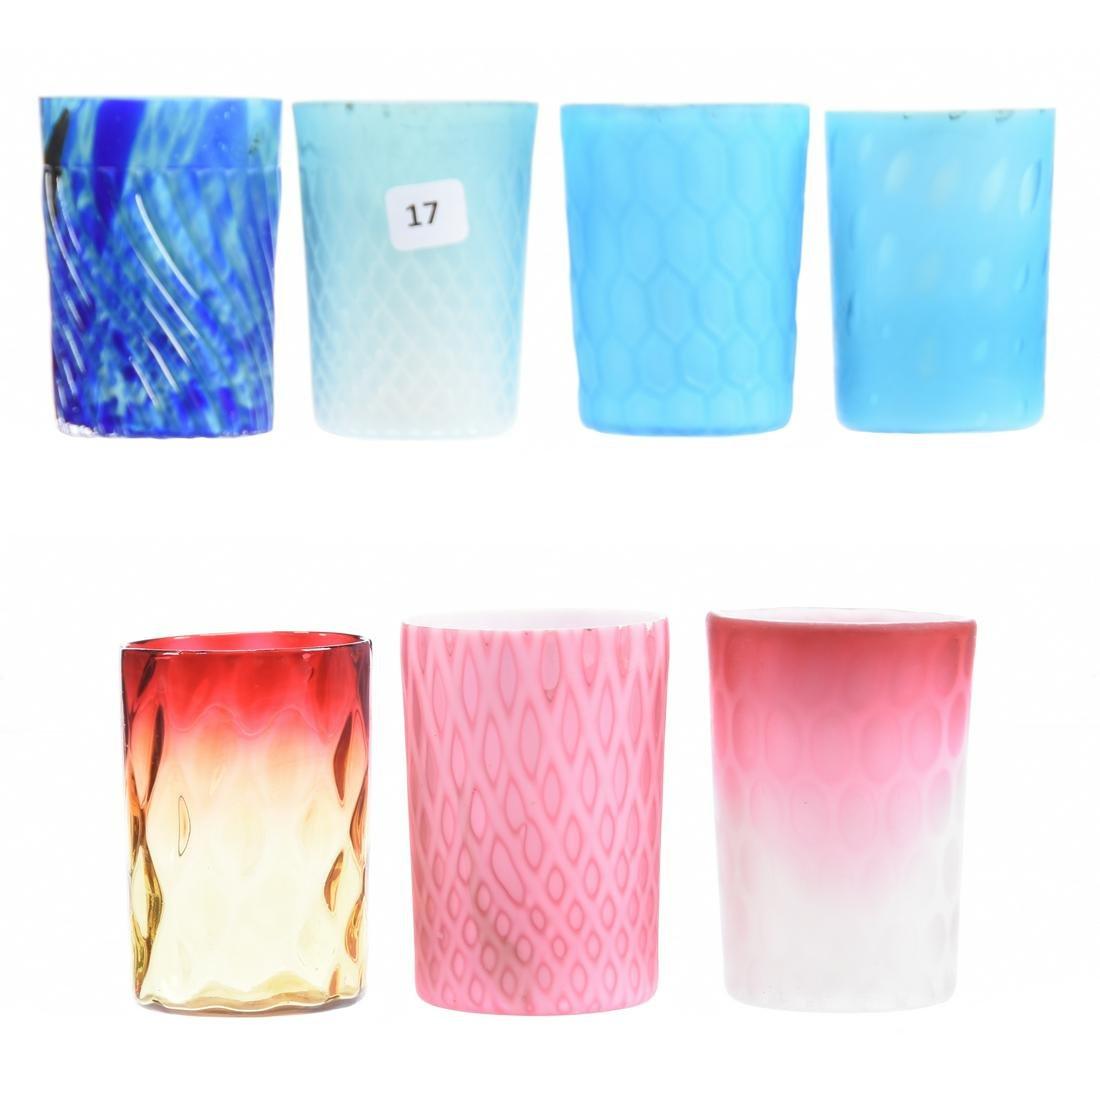 (7) Art Glass Tumblers